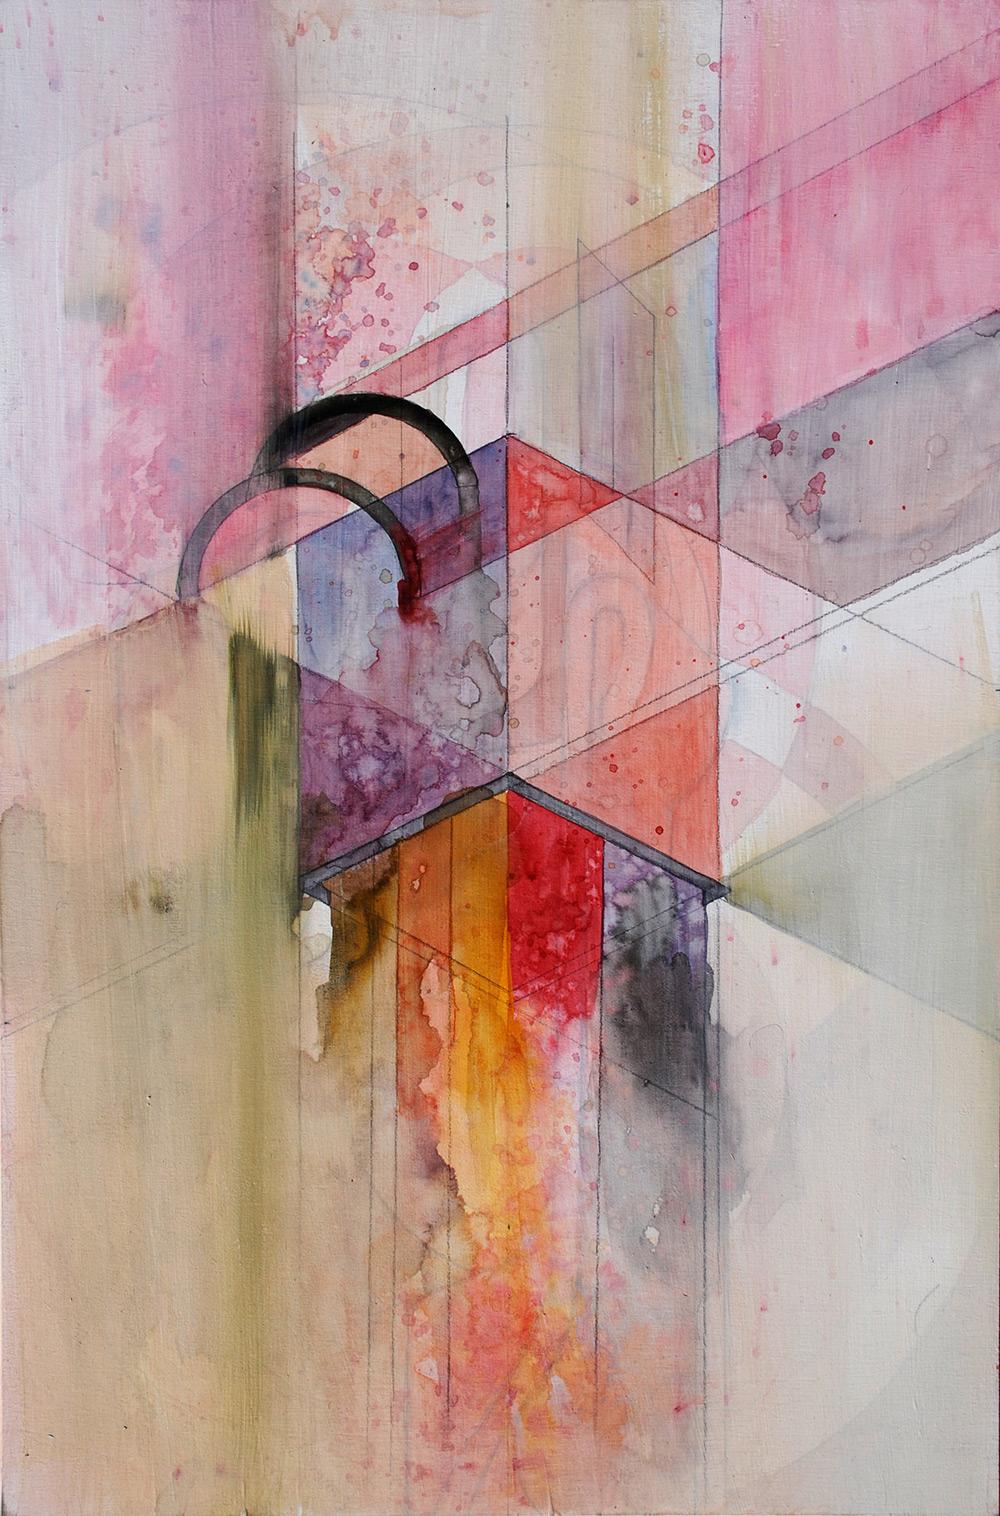 "Second Floor  Mixed media on panel 10 x 14"" 2011"